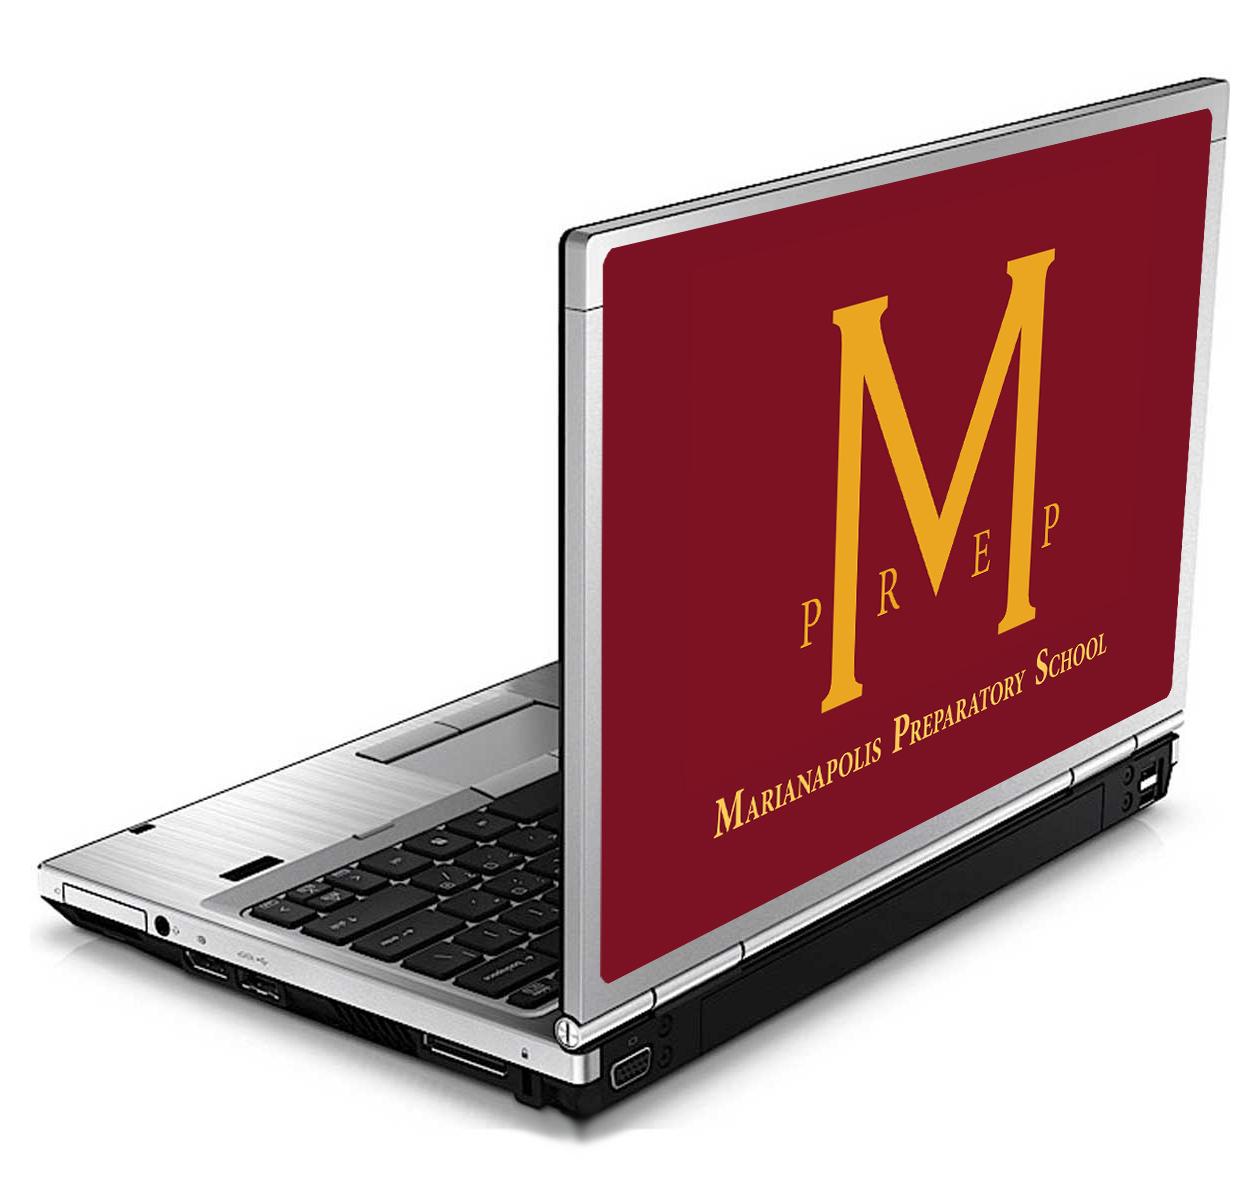 MarianapolisPrepSchool_HP8460p_Mockup_VinylSkin School Branding